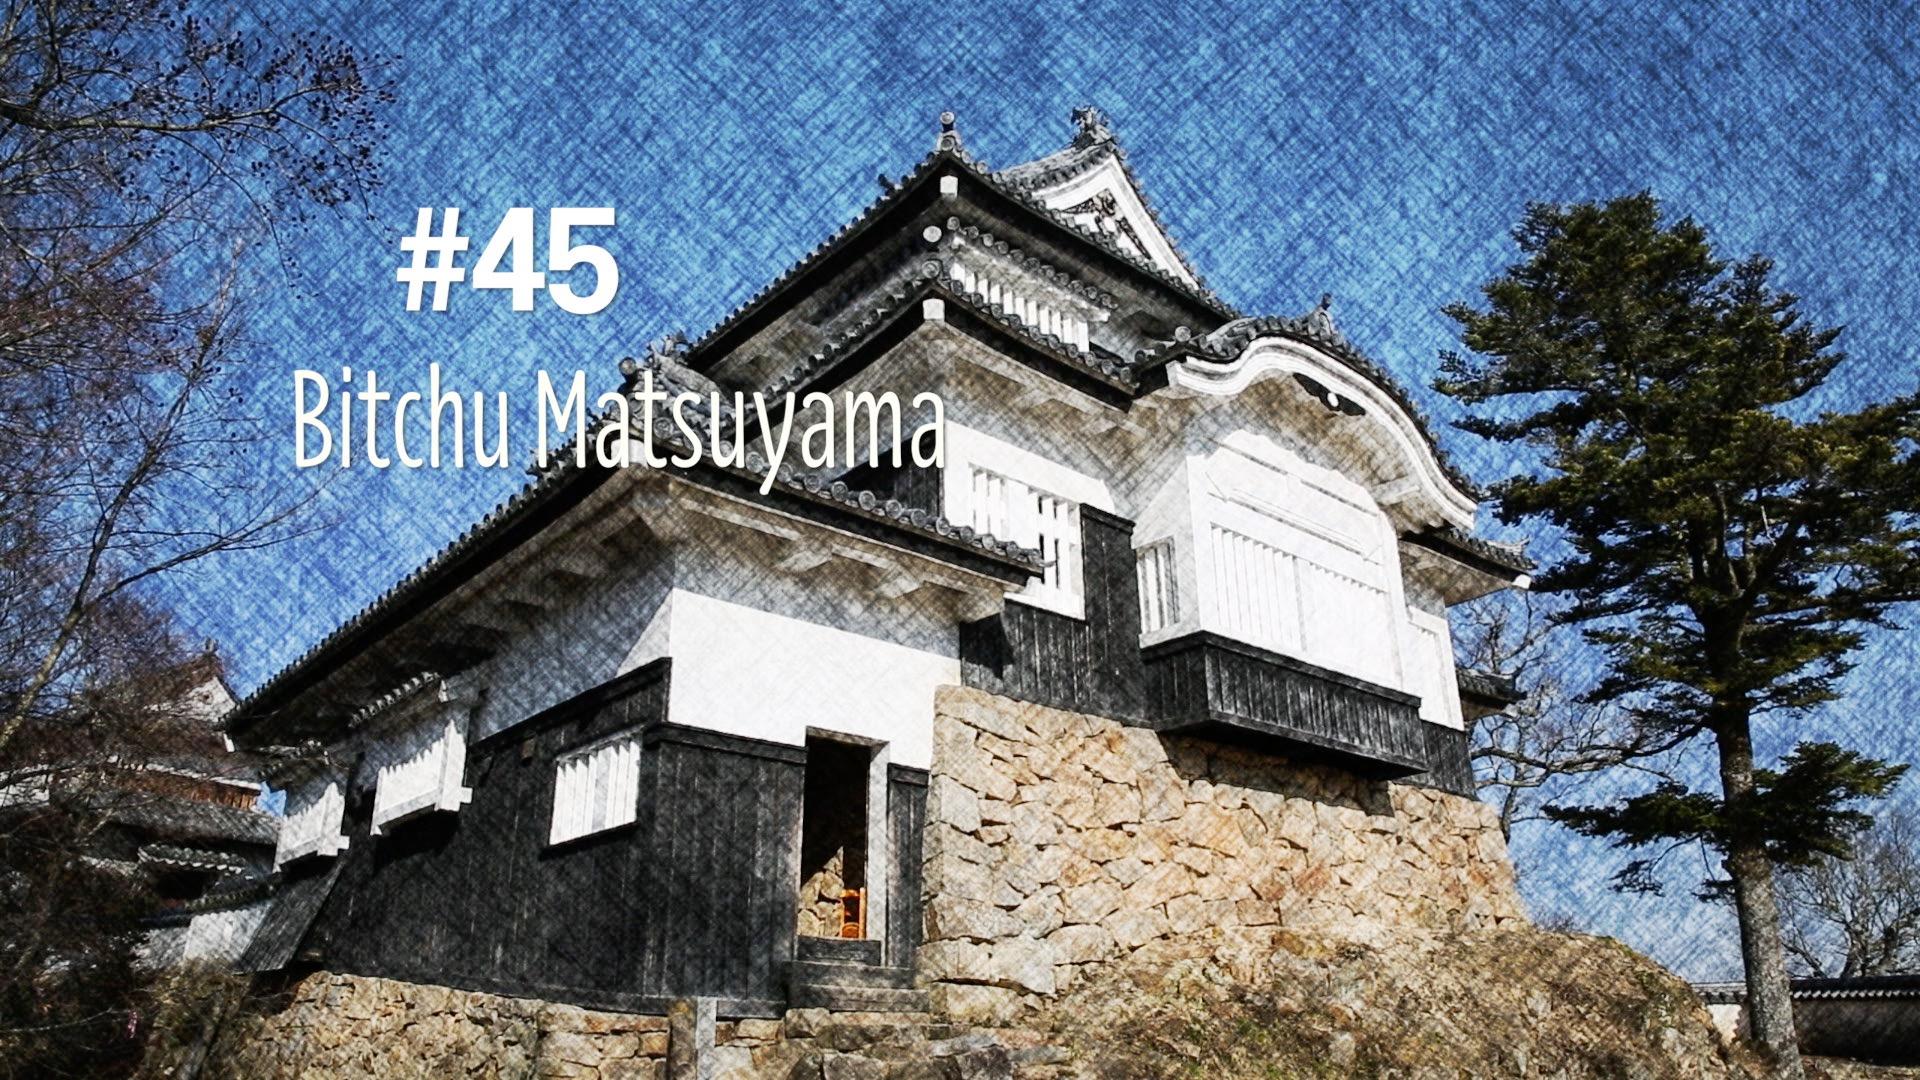 Le château de Bitchu Matsuyama